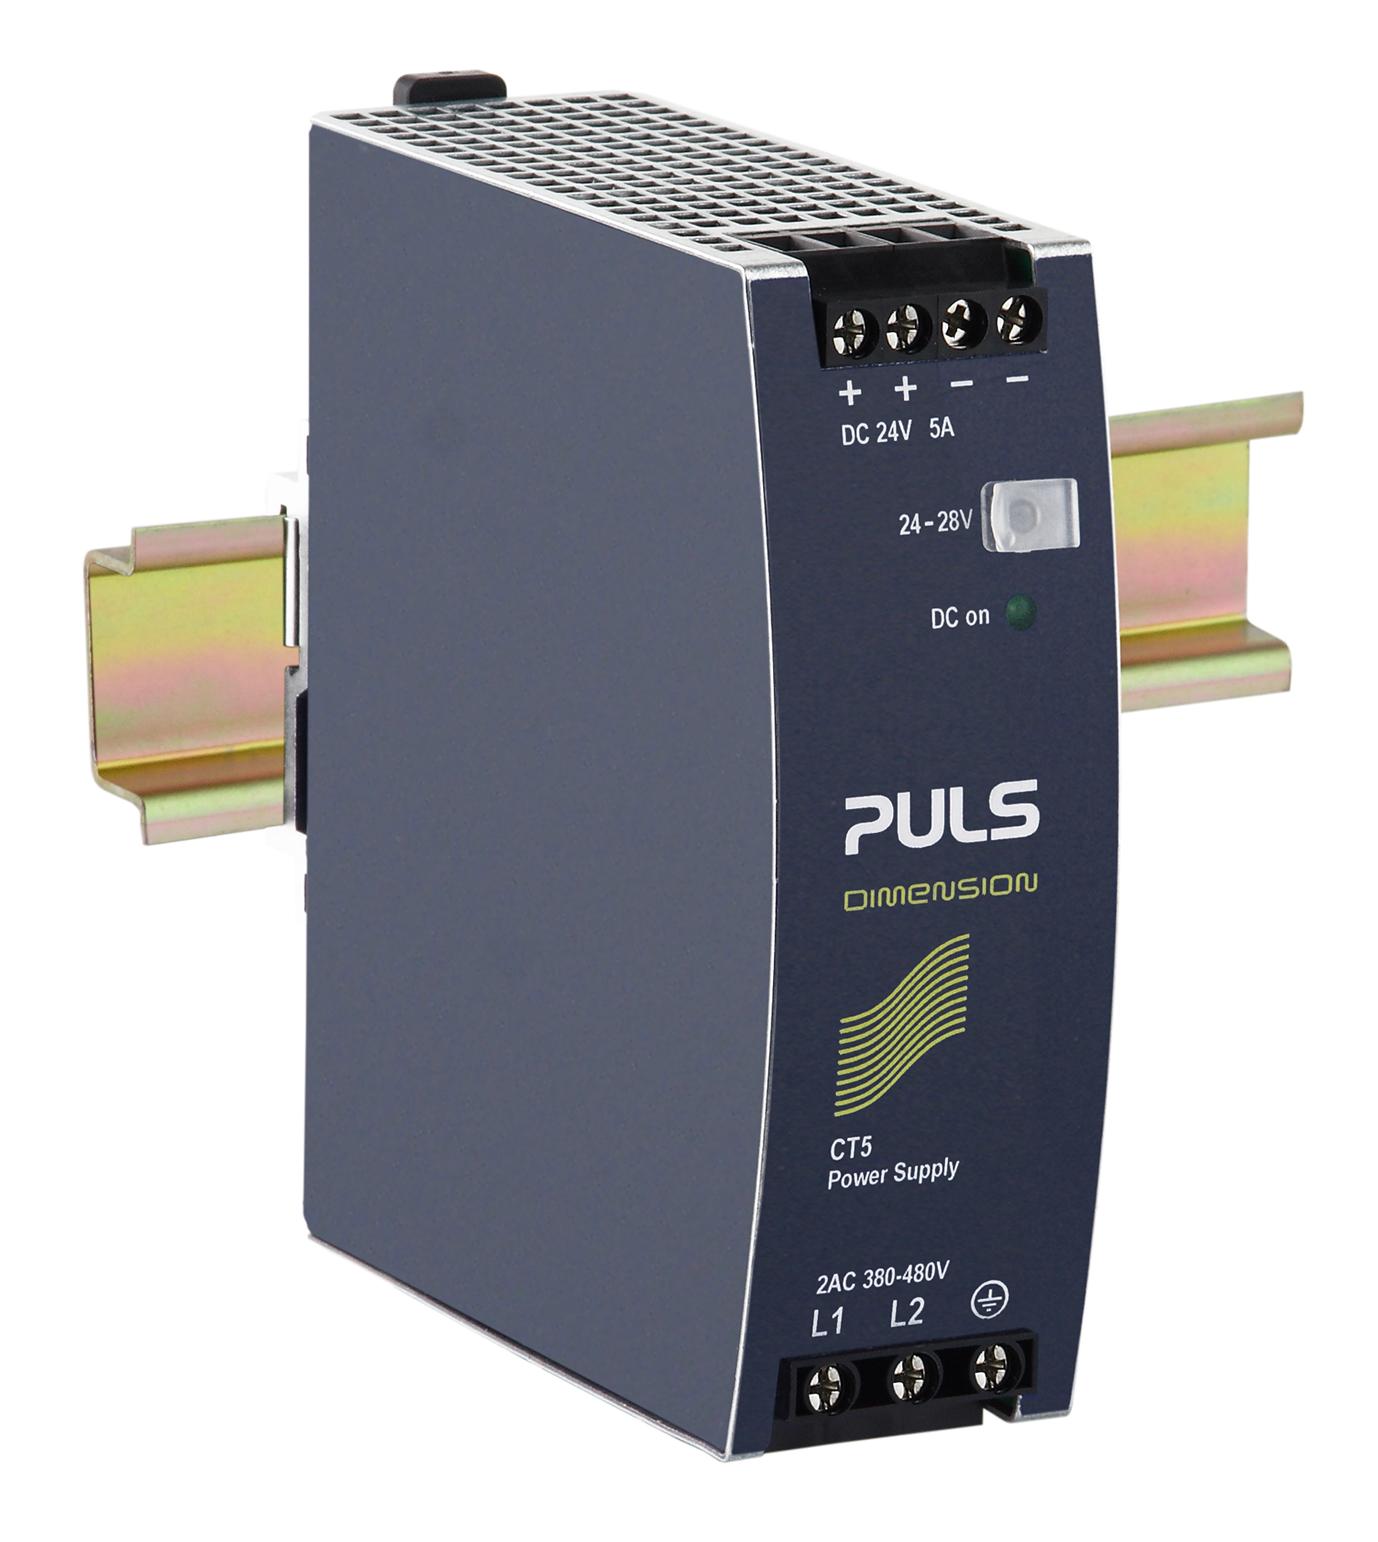 Neu /& OVP 24-28V PULS CT5.241 Netzteil 380-480V